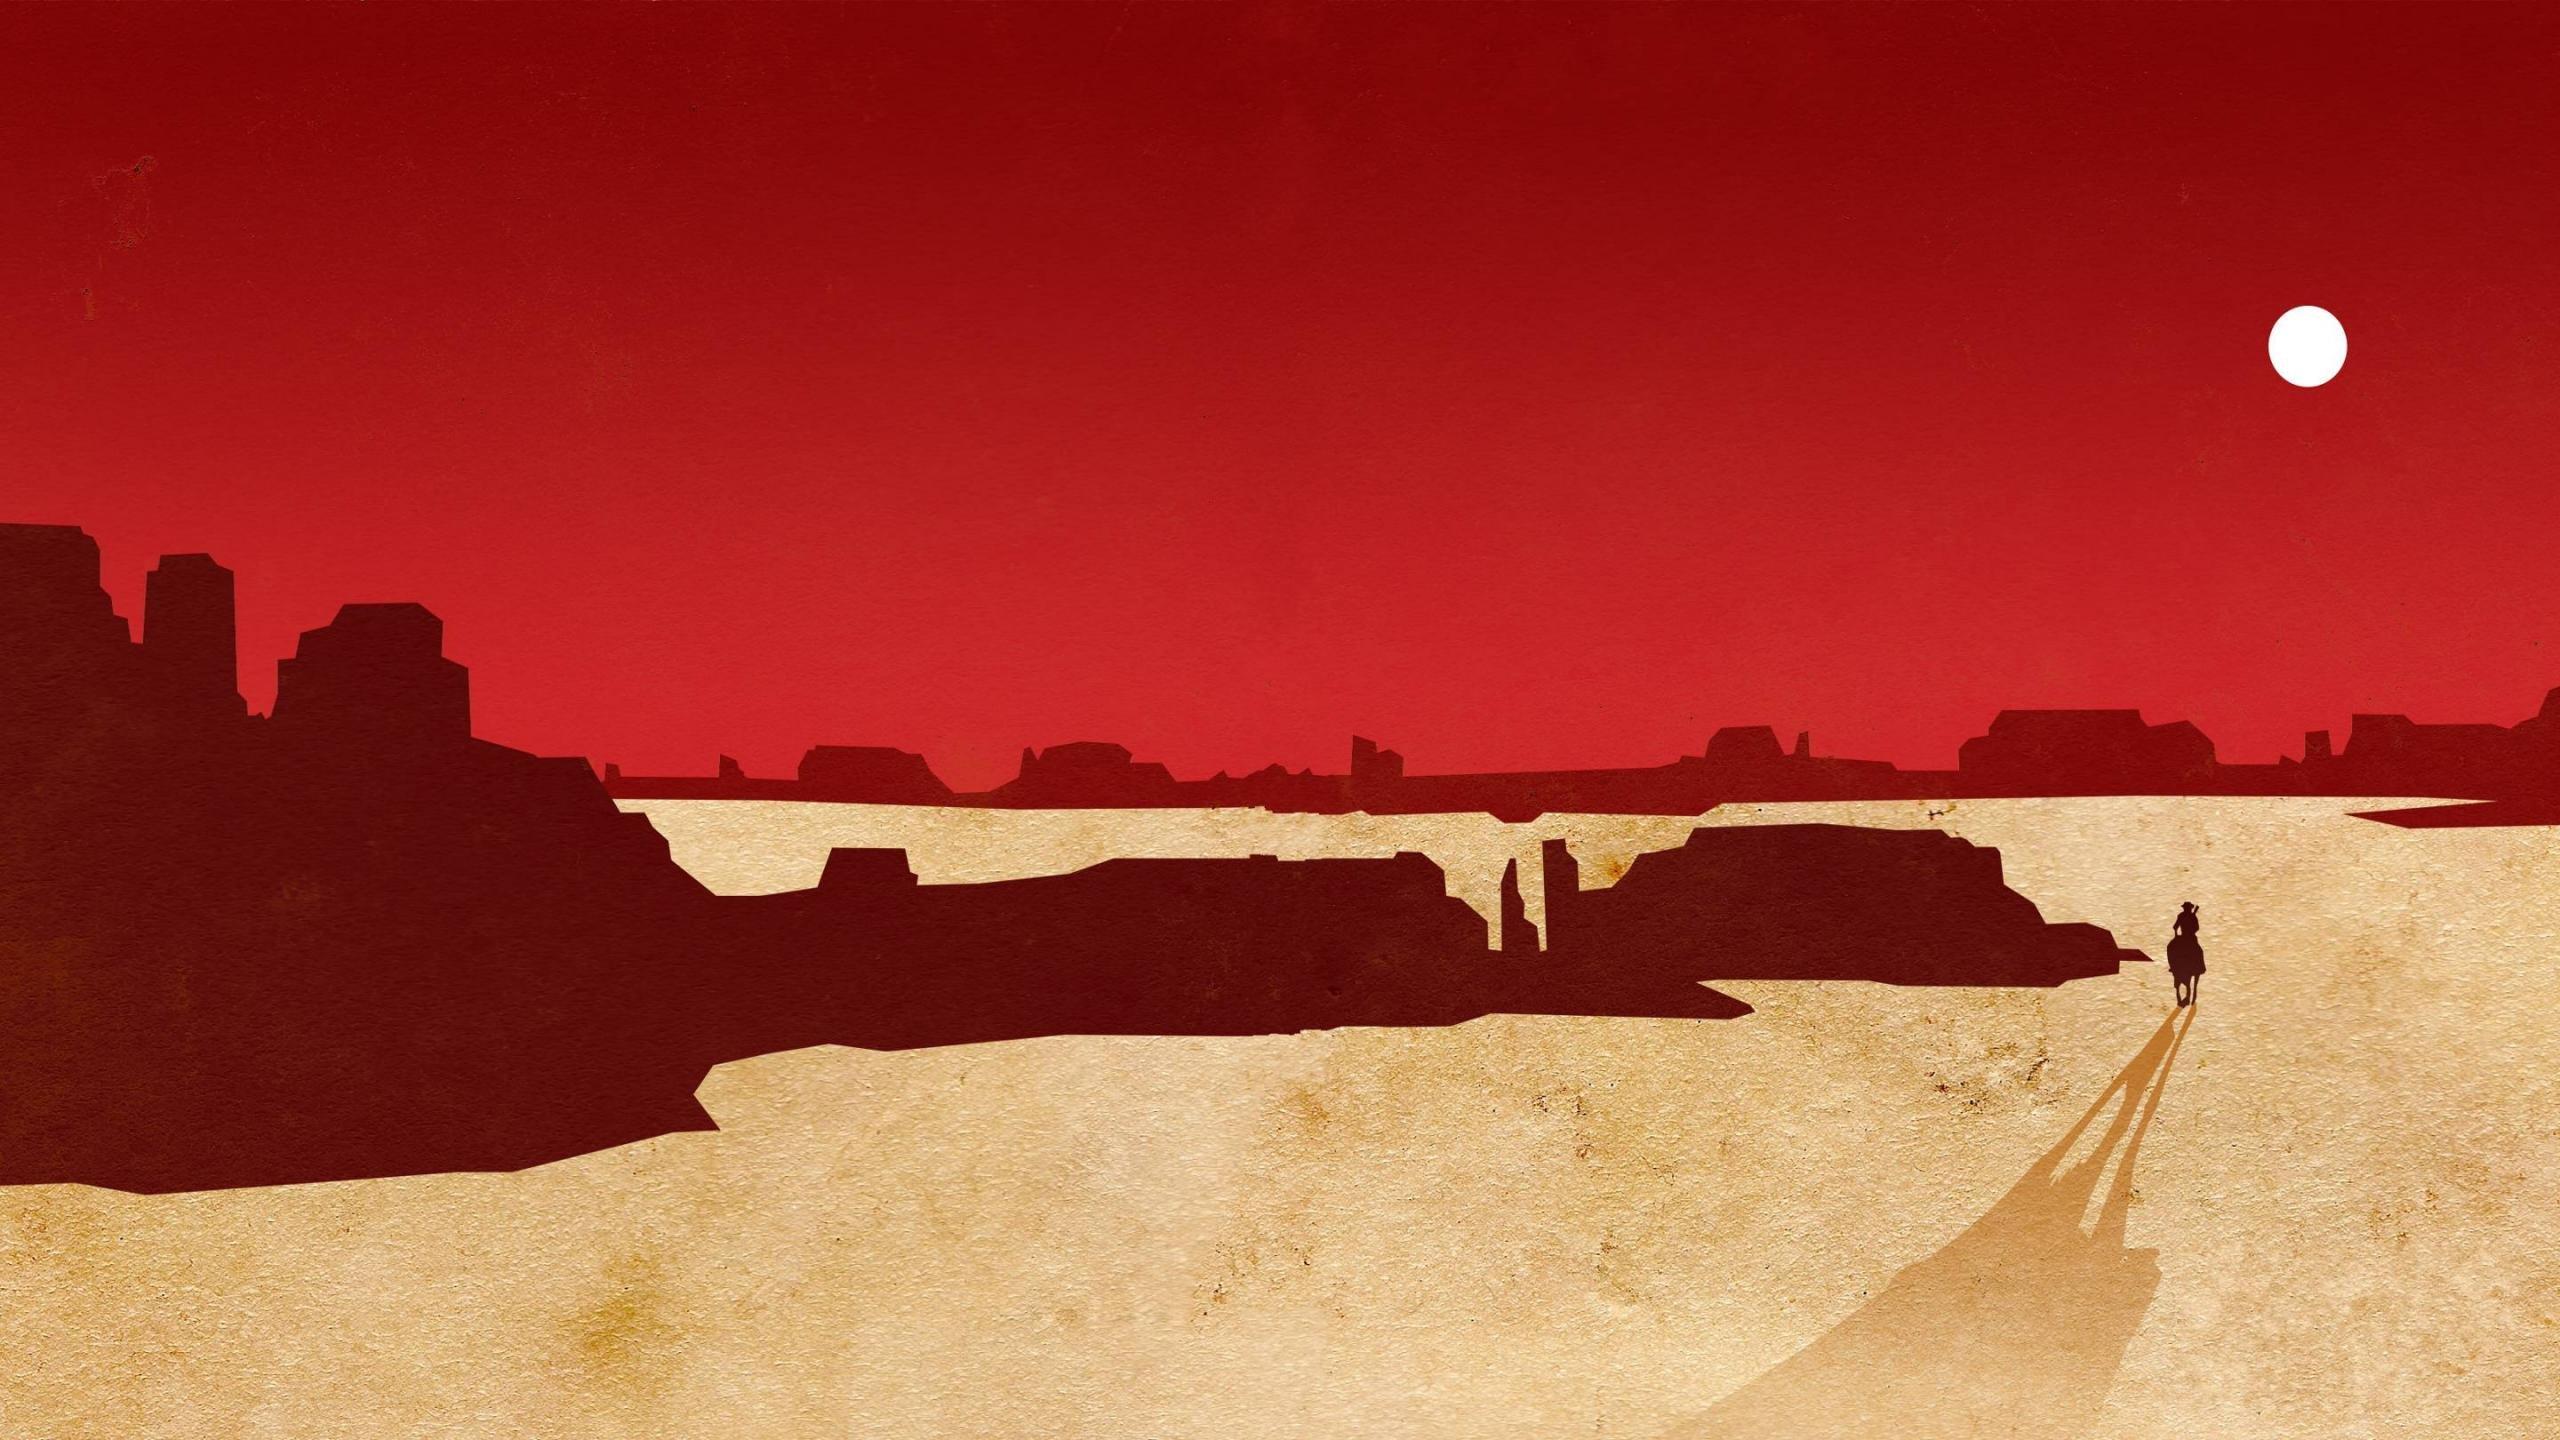 Red Dead Redemption Wallpapers 2560x1440 Desktop Backgrounds